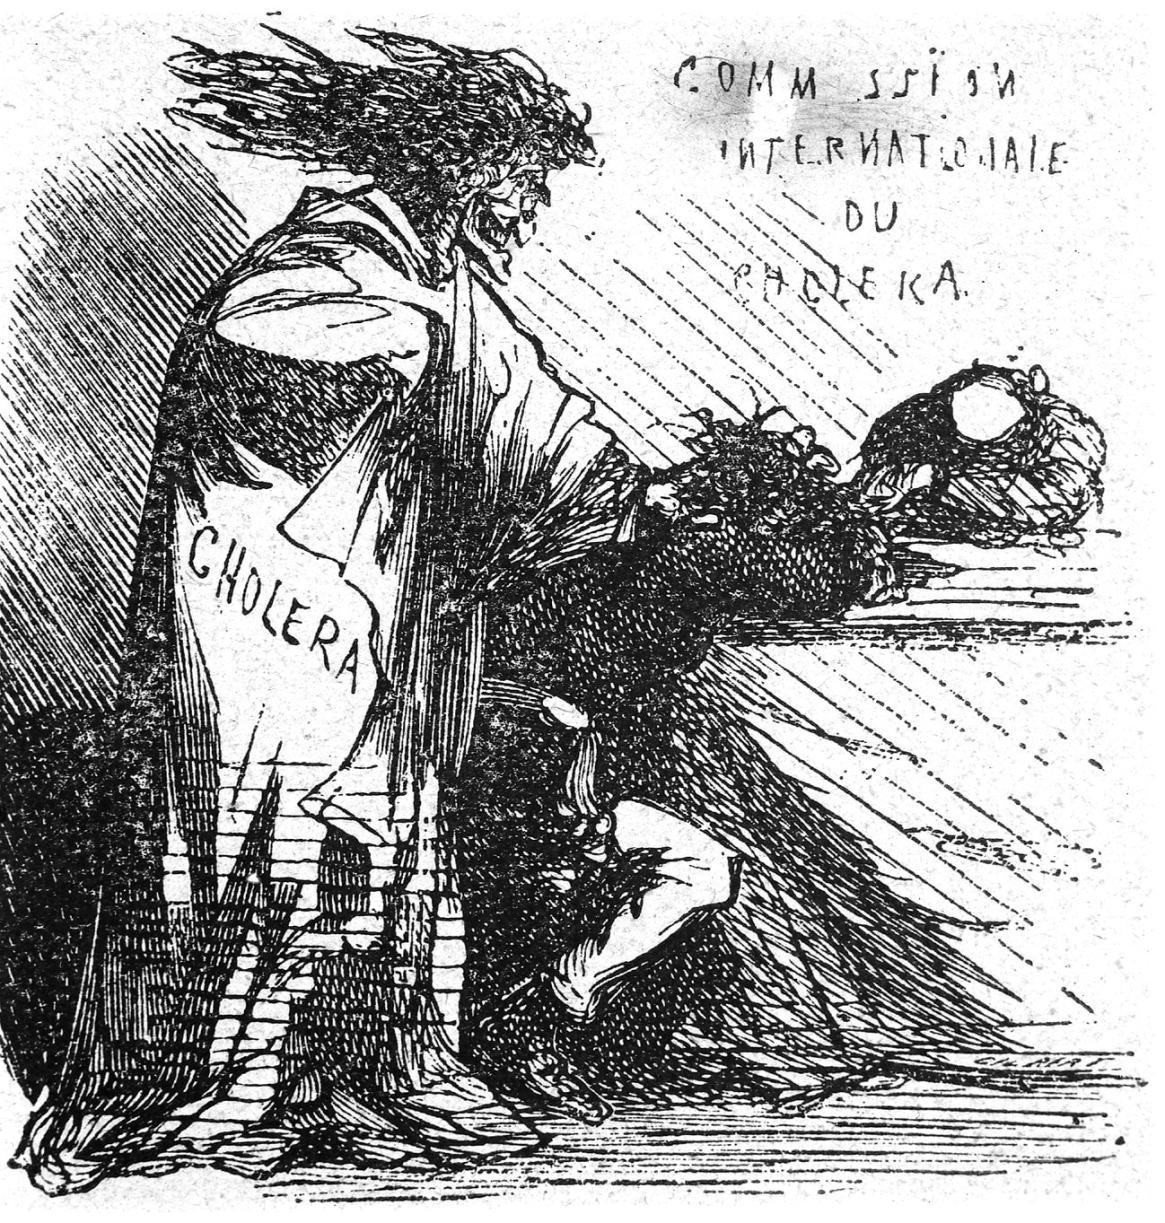 Cham, Illustration representing Cholera